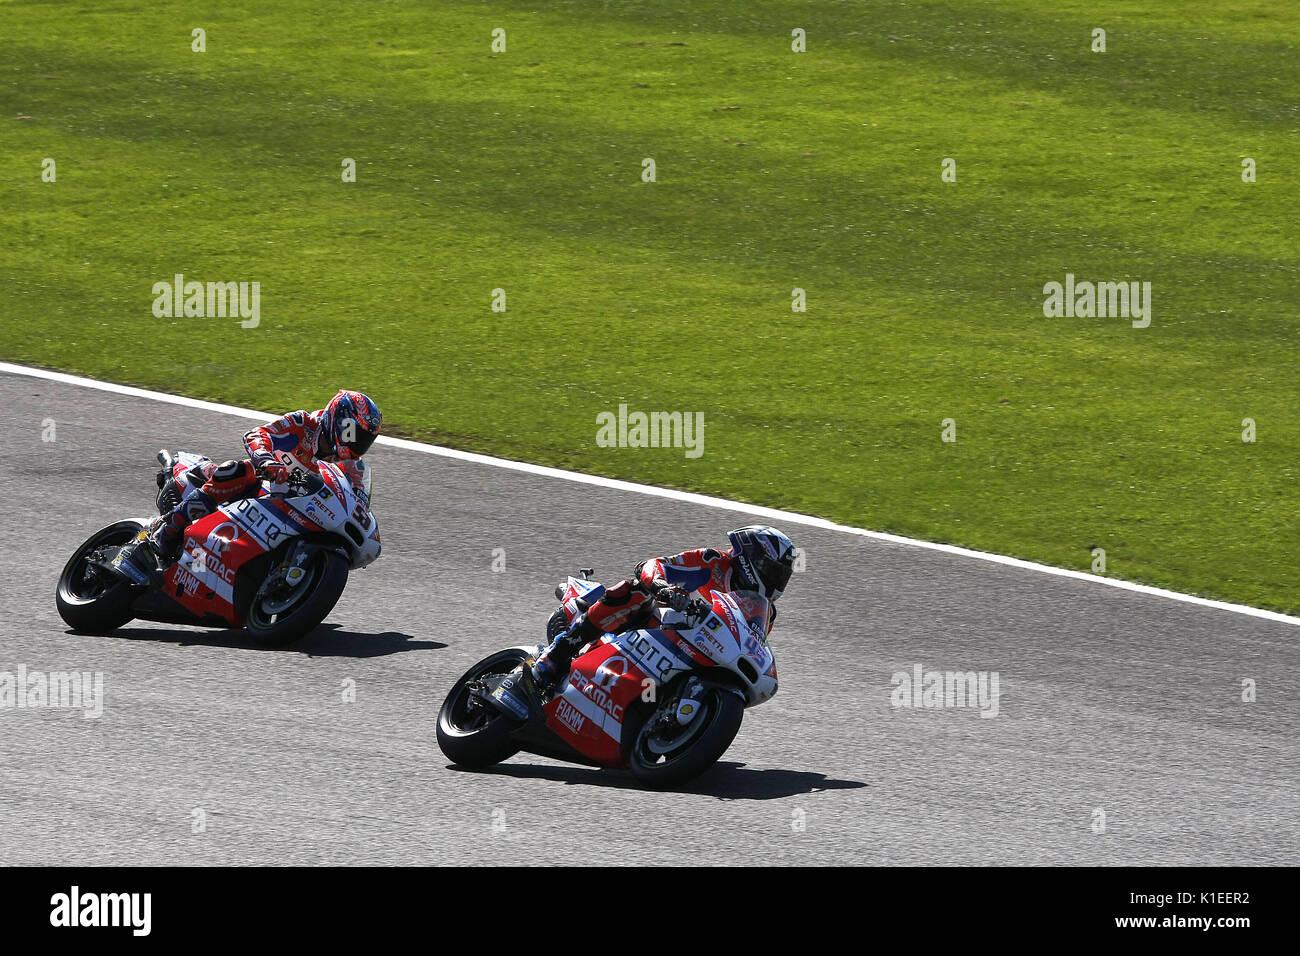 Silverstone, UK. 27th Aug, 2017.  team racing - the Prama Ducati's of Scott Redding and Danilo Petrucci during the OCTO British MotoGP Credit: Motofoto/Alamy Live News - Stock Image